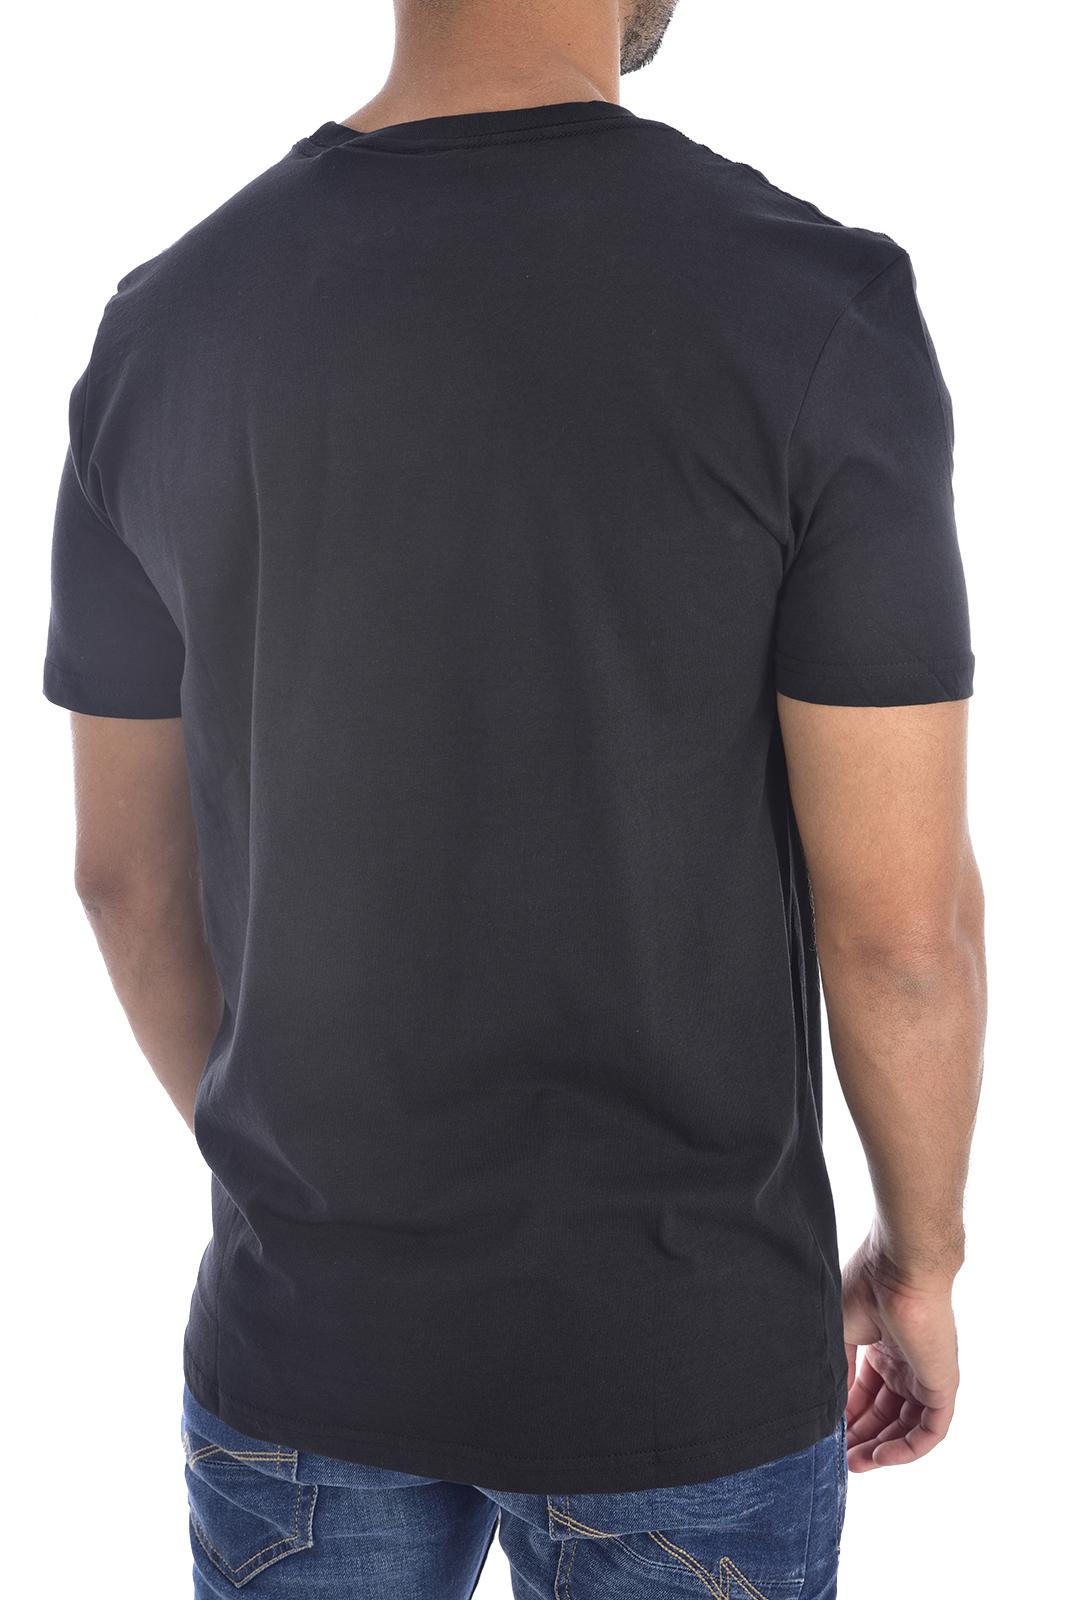 Tee-shirts  Kaporal PASTO H19 BLACK